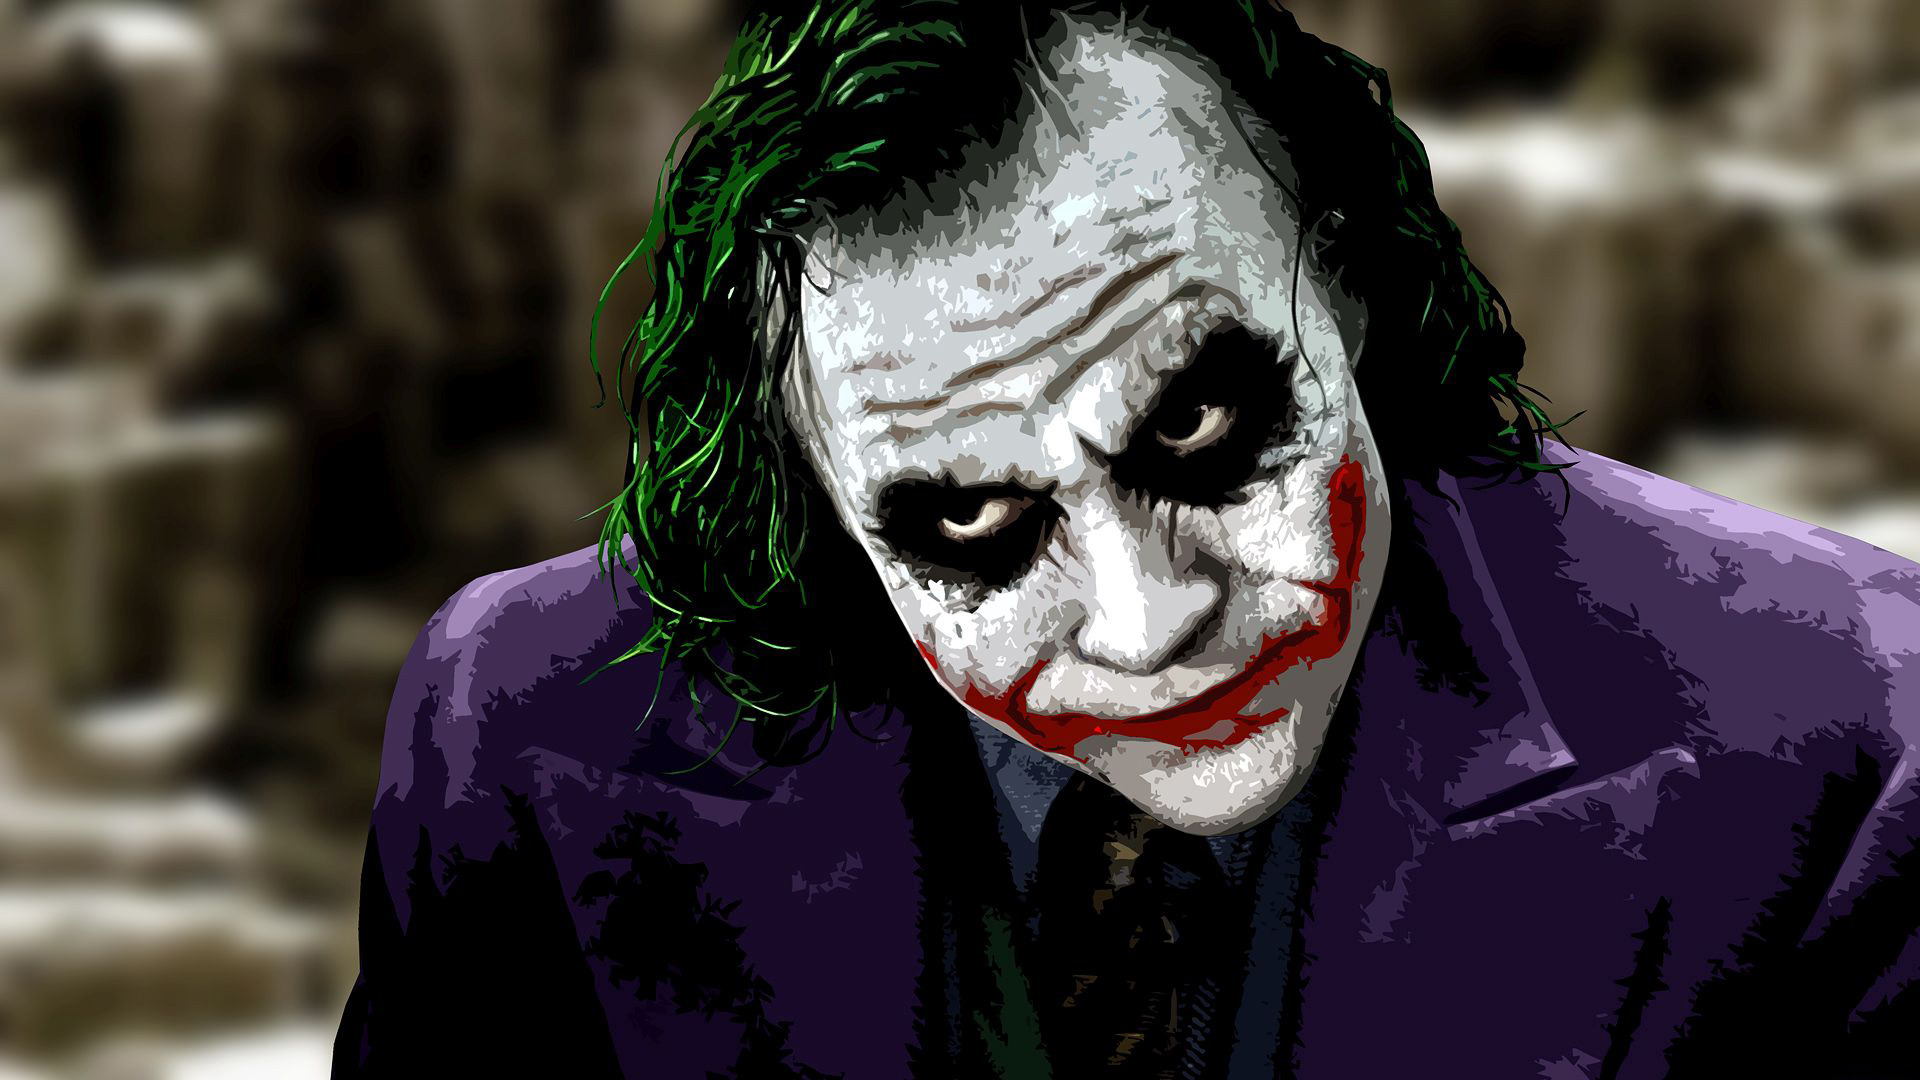 The Joker   The Dark Knight wallpaper   1208189 1920x1080